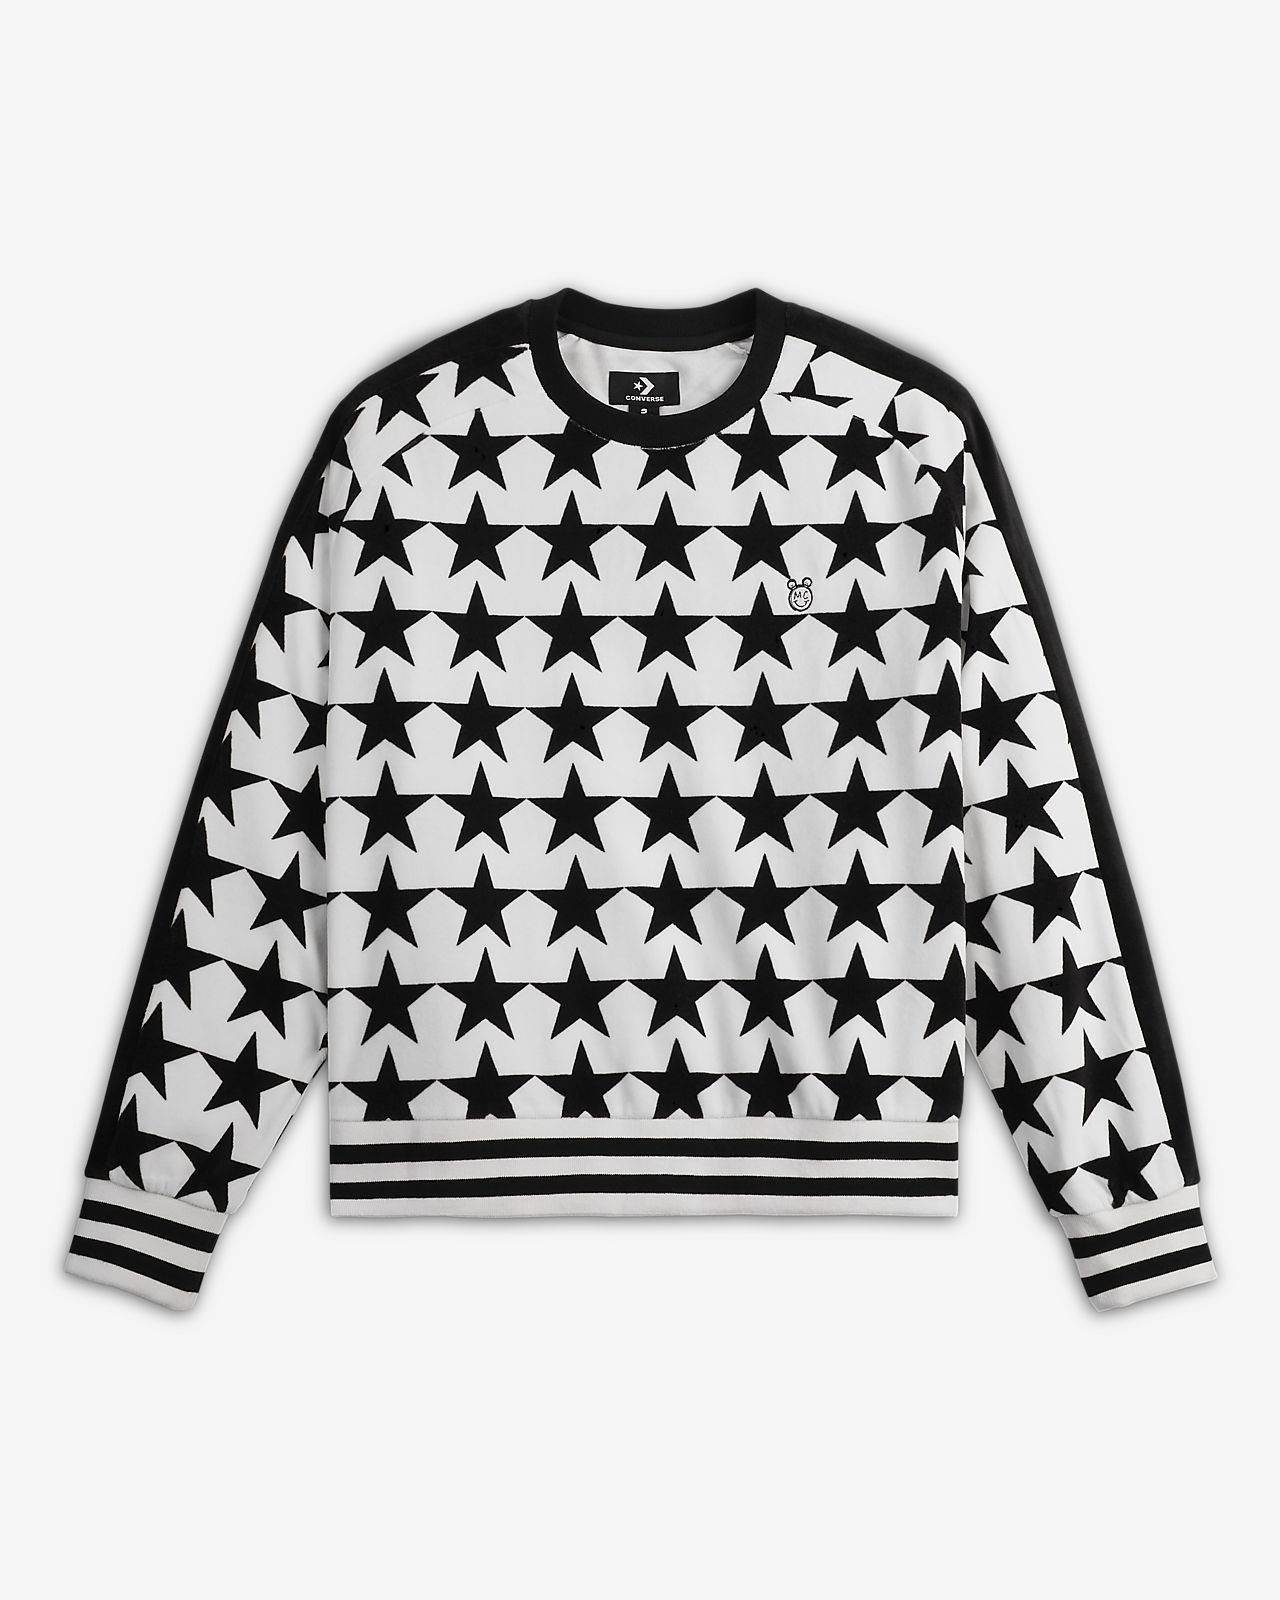 Converse x Miley Cyrus Women's Velour Sweatshirt